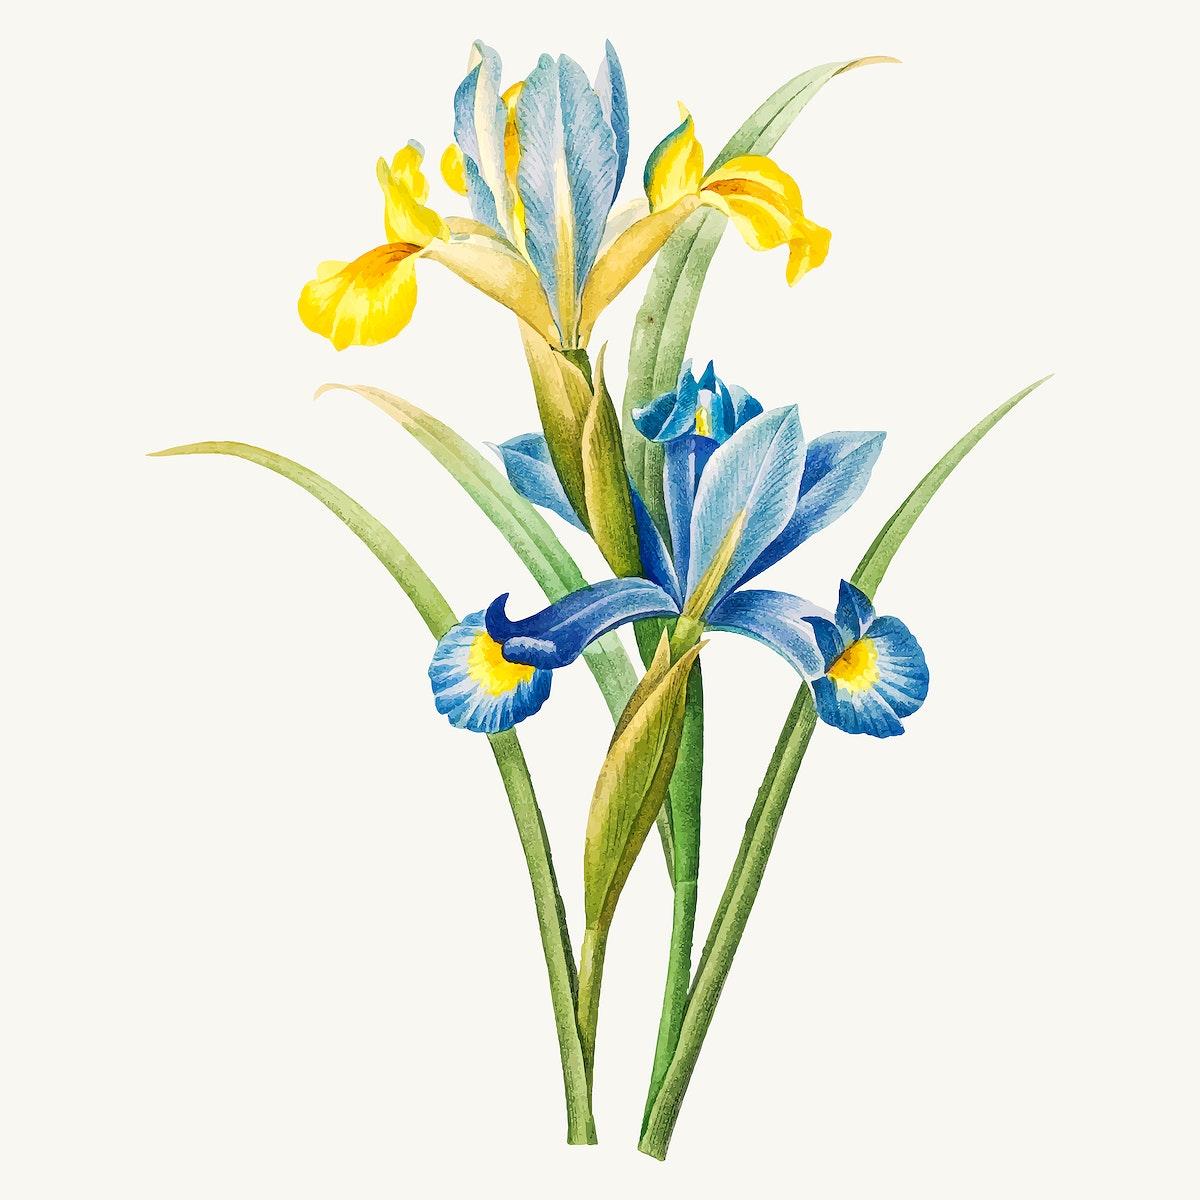 Spanish iris flower b vector, remixed from artworks by Pierre-Joseph Redouté